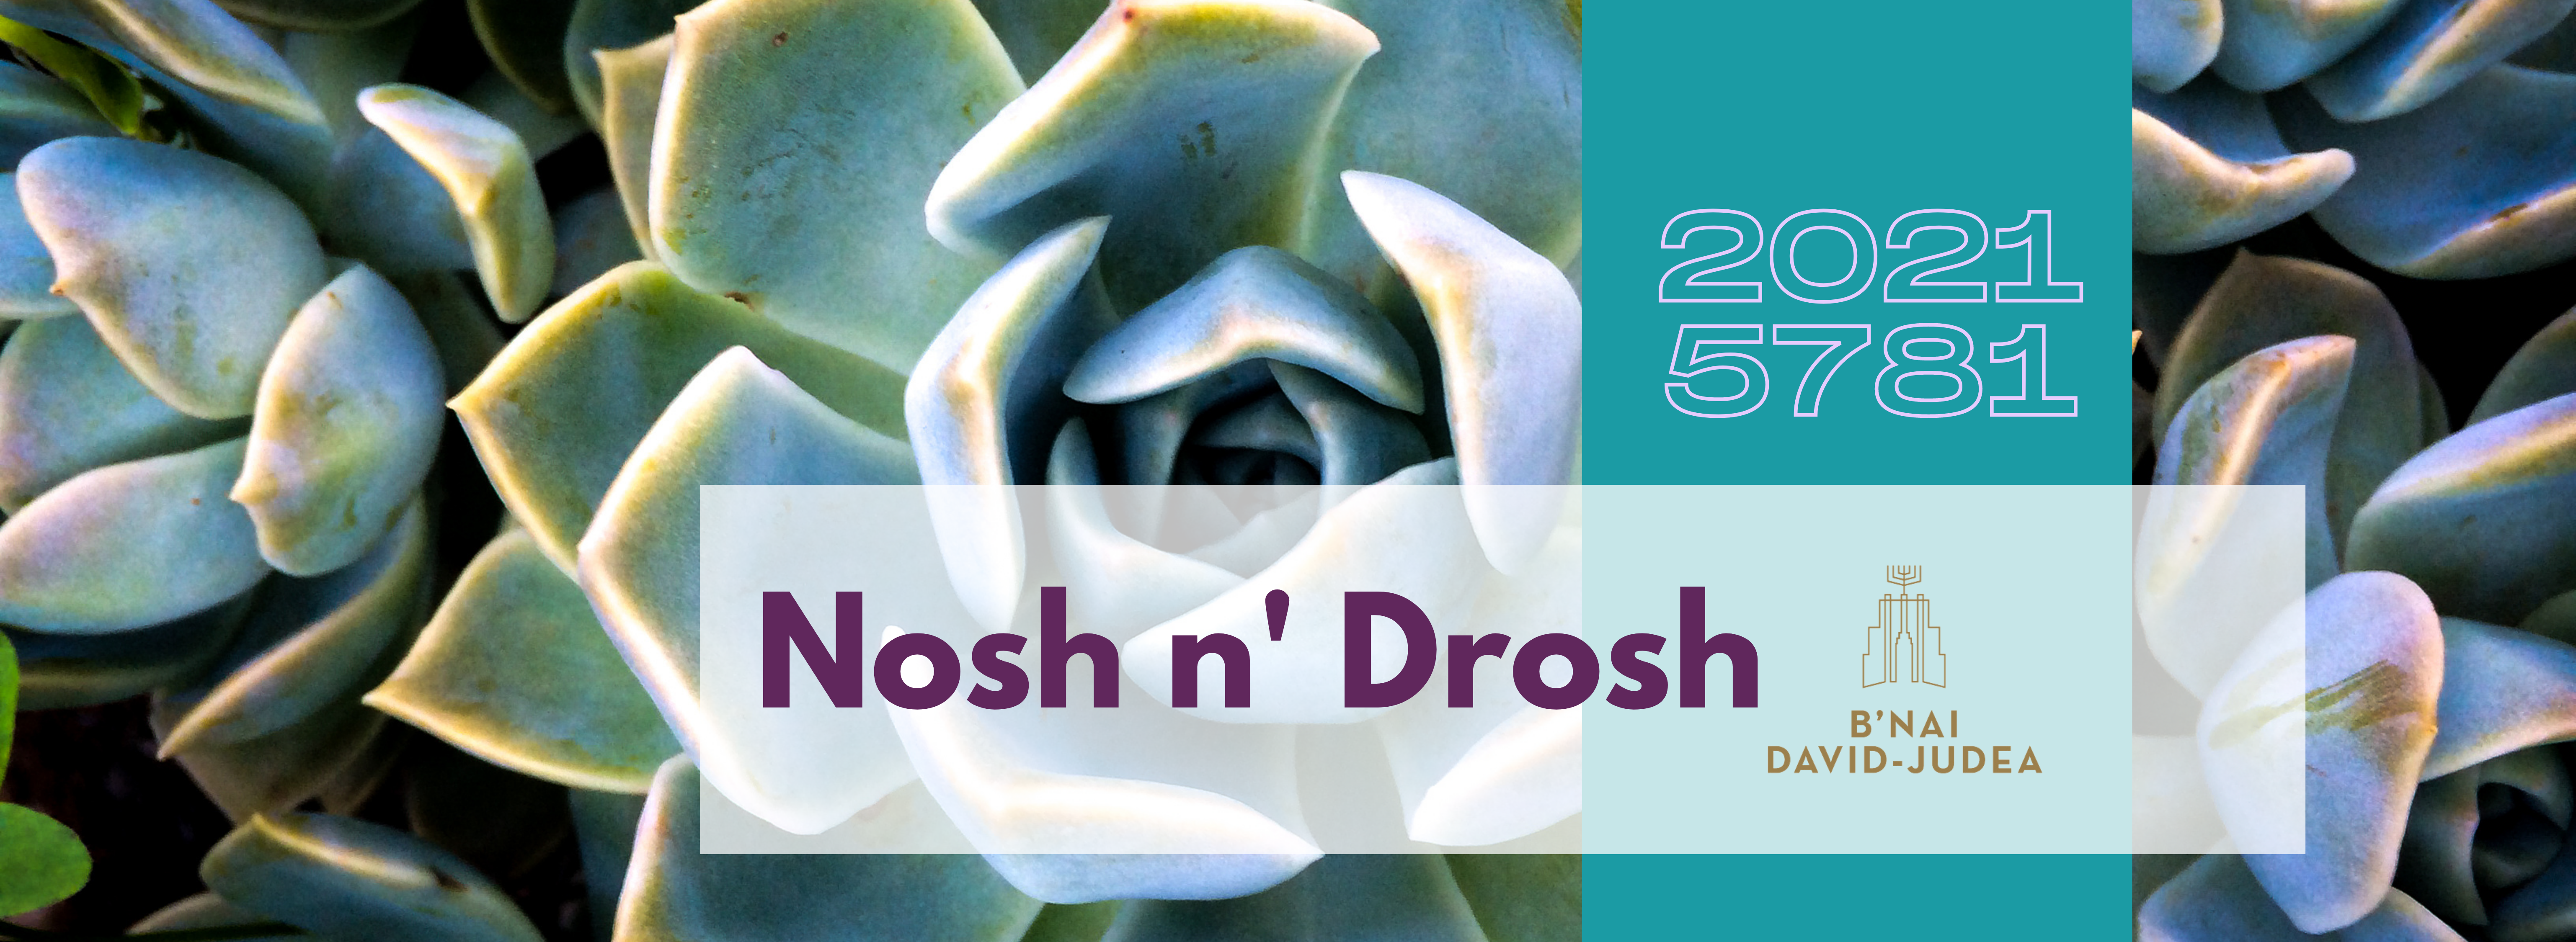 "<a href=""/noshndrosh""                                     target=""_blank"">                                                                 <span class=""slider_title"">                                     Nosh N Drosh                                </span>                                                                 </a>                                                                                                                                                                                      <a href=""/noshndrosh"" class=""slider_link""                             target=""_blank"">                             Join Us!                            </a>"